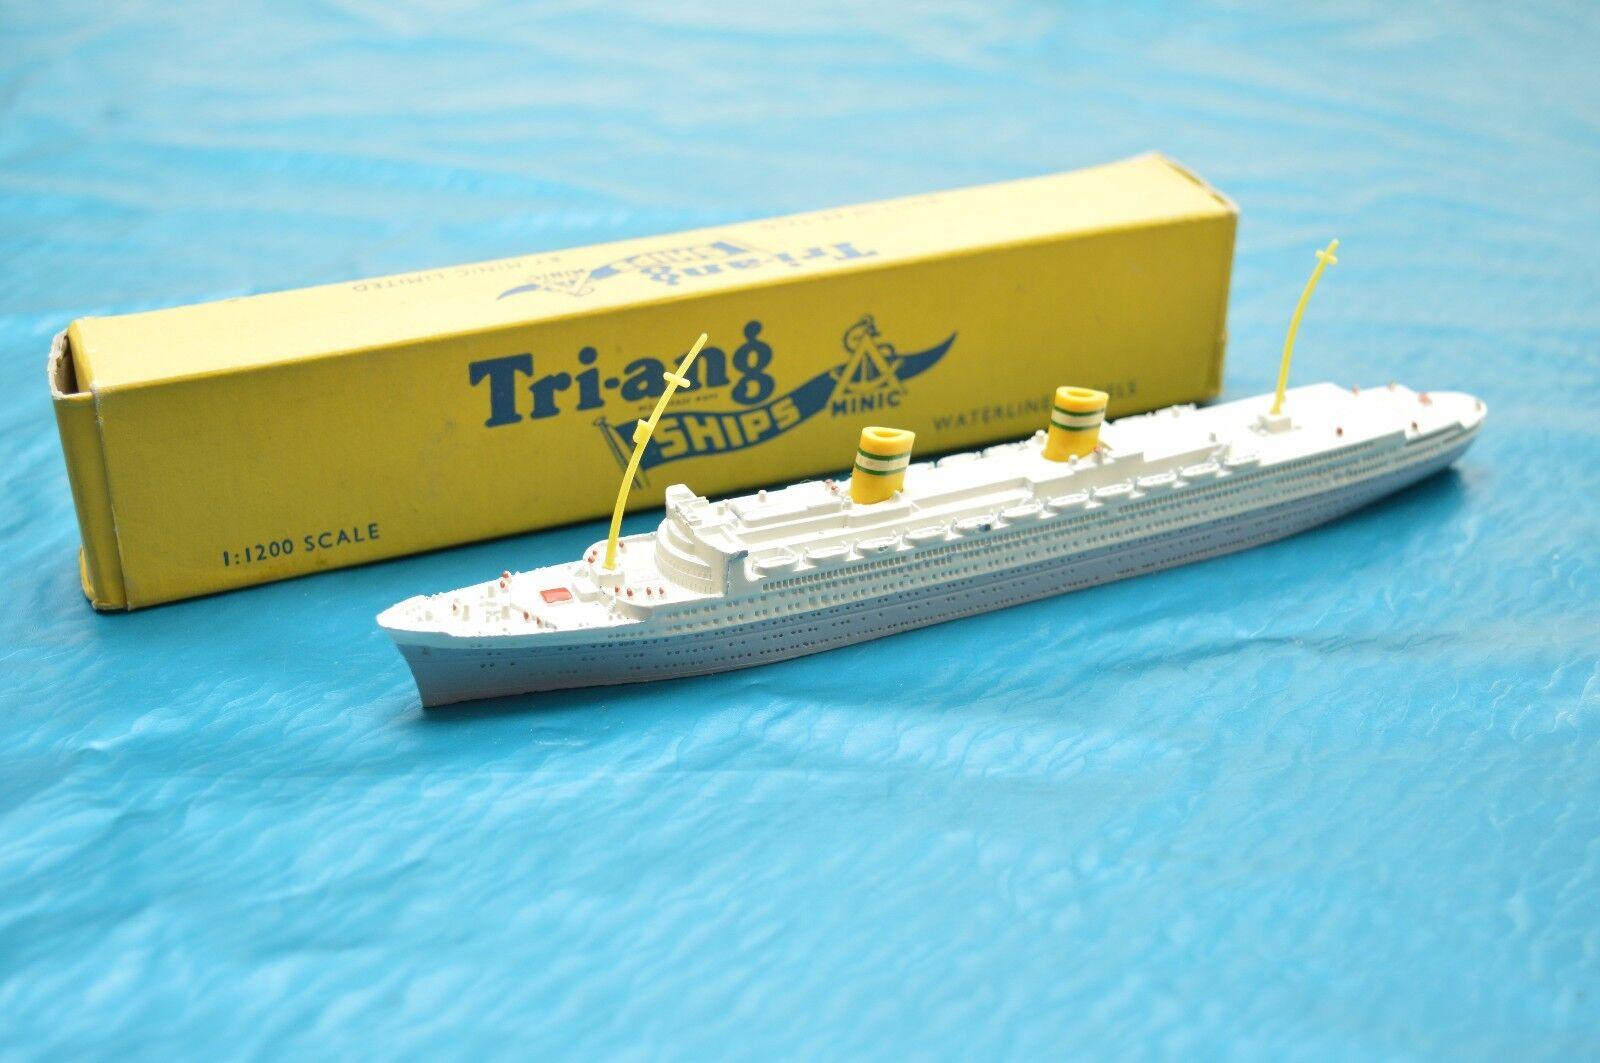 tienda de bajo costo Triang Minic Minic Minic Ships M.706 S.S. Cook AMSTERDAM  venta al por mayor barato